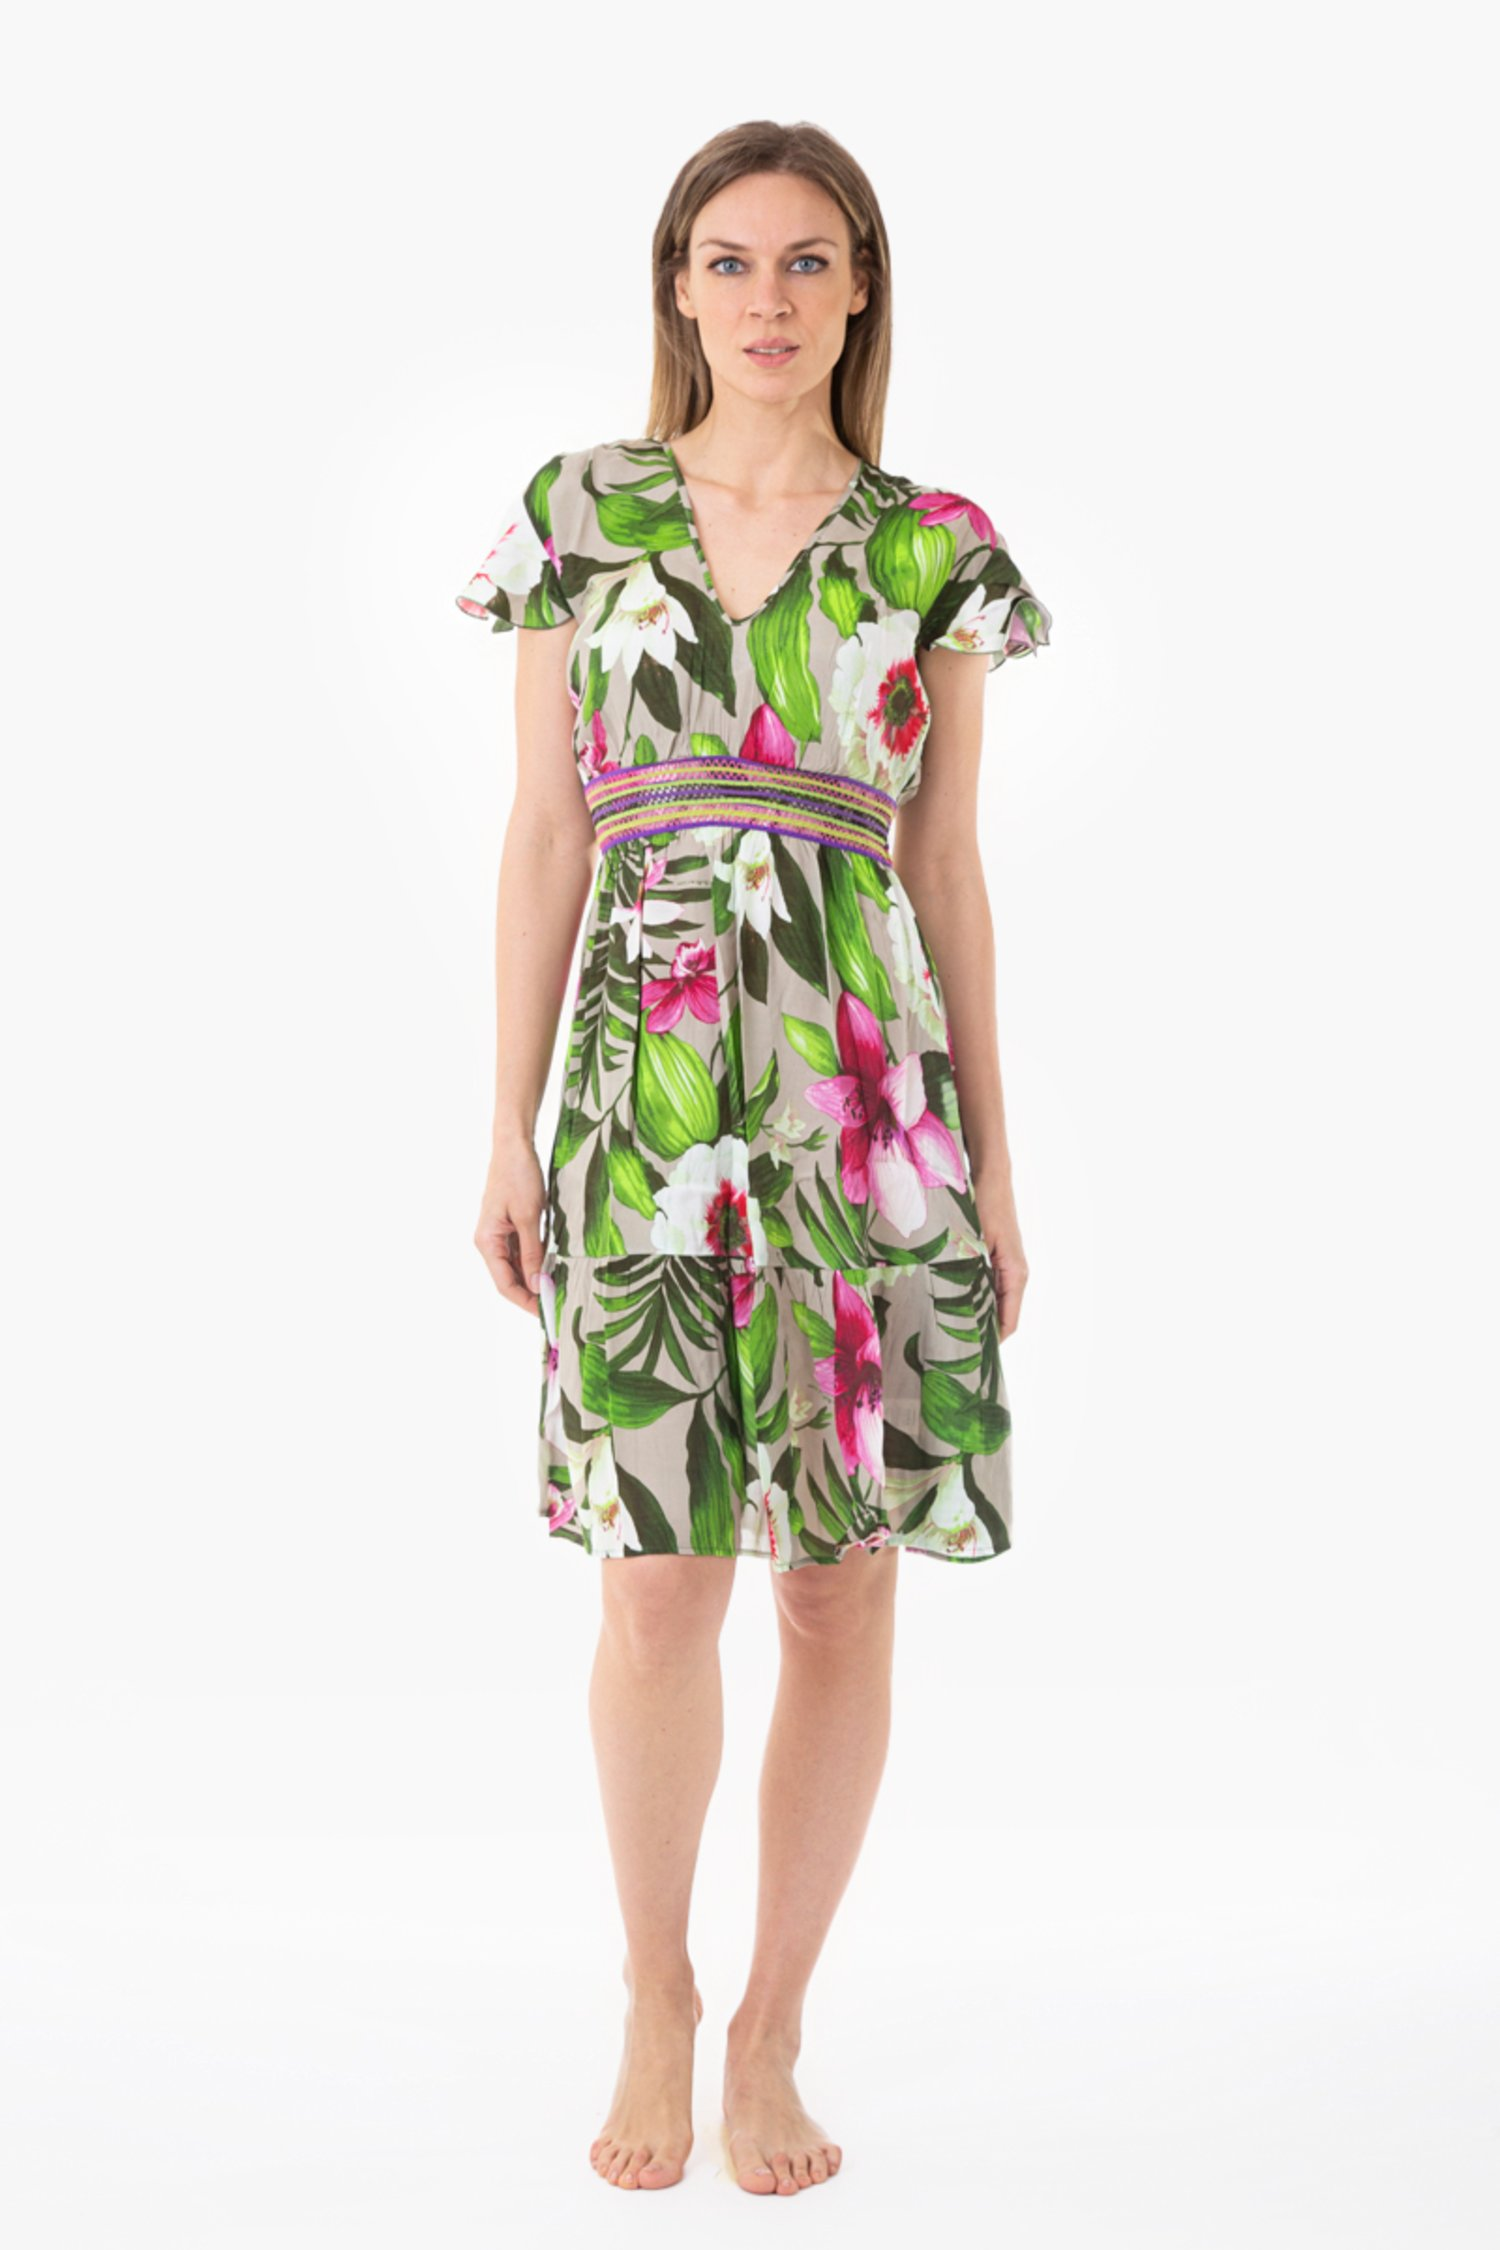 LONGUETTE DRESS TRIMMINGS - Tropical Flowers Beige